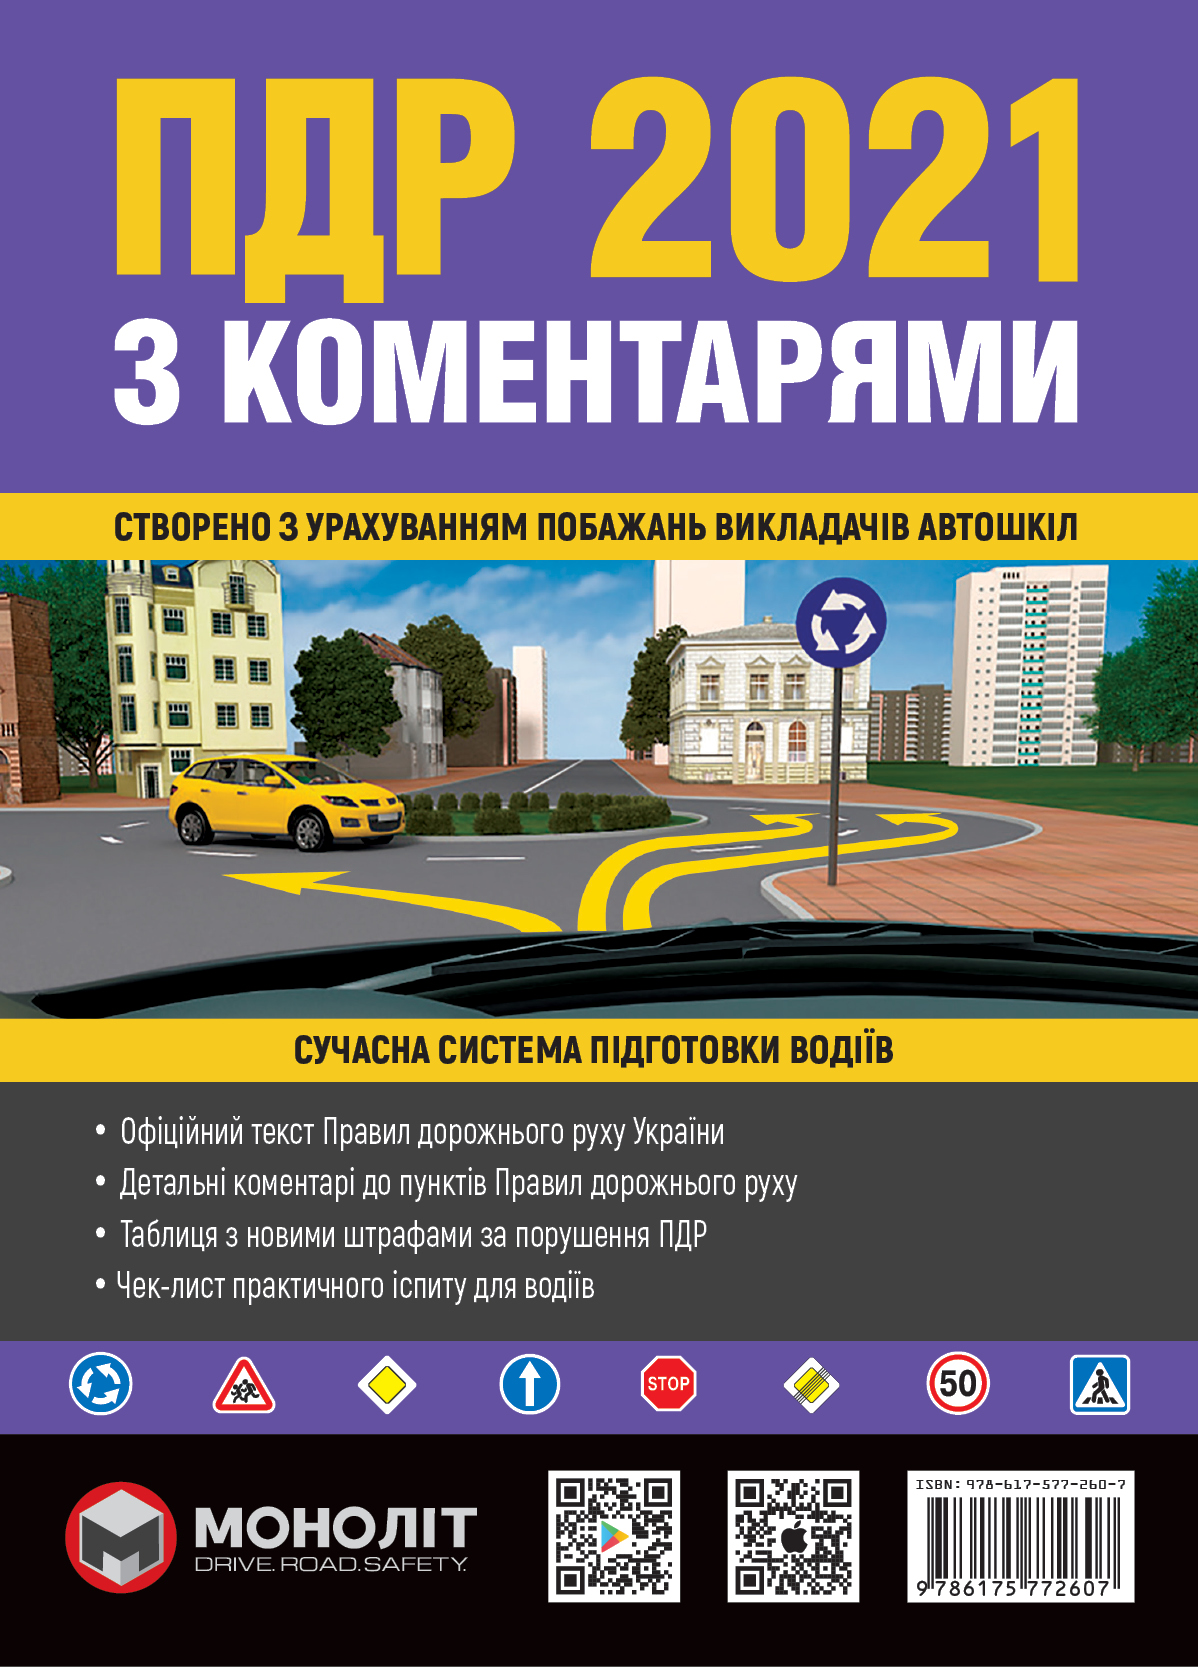 Правила дорожнього руху України з коменарями 2021